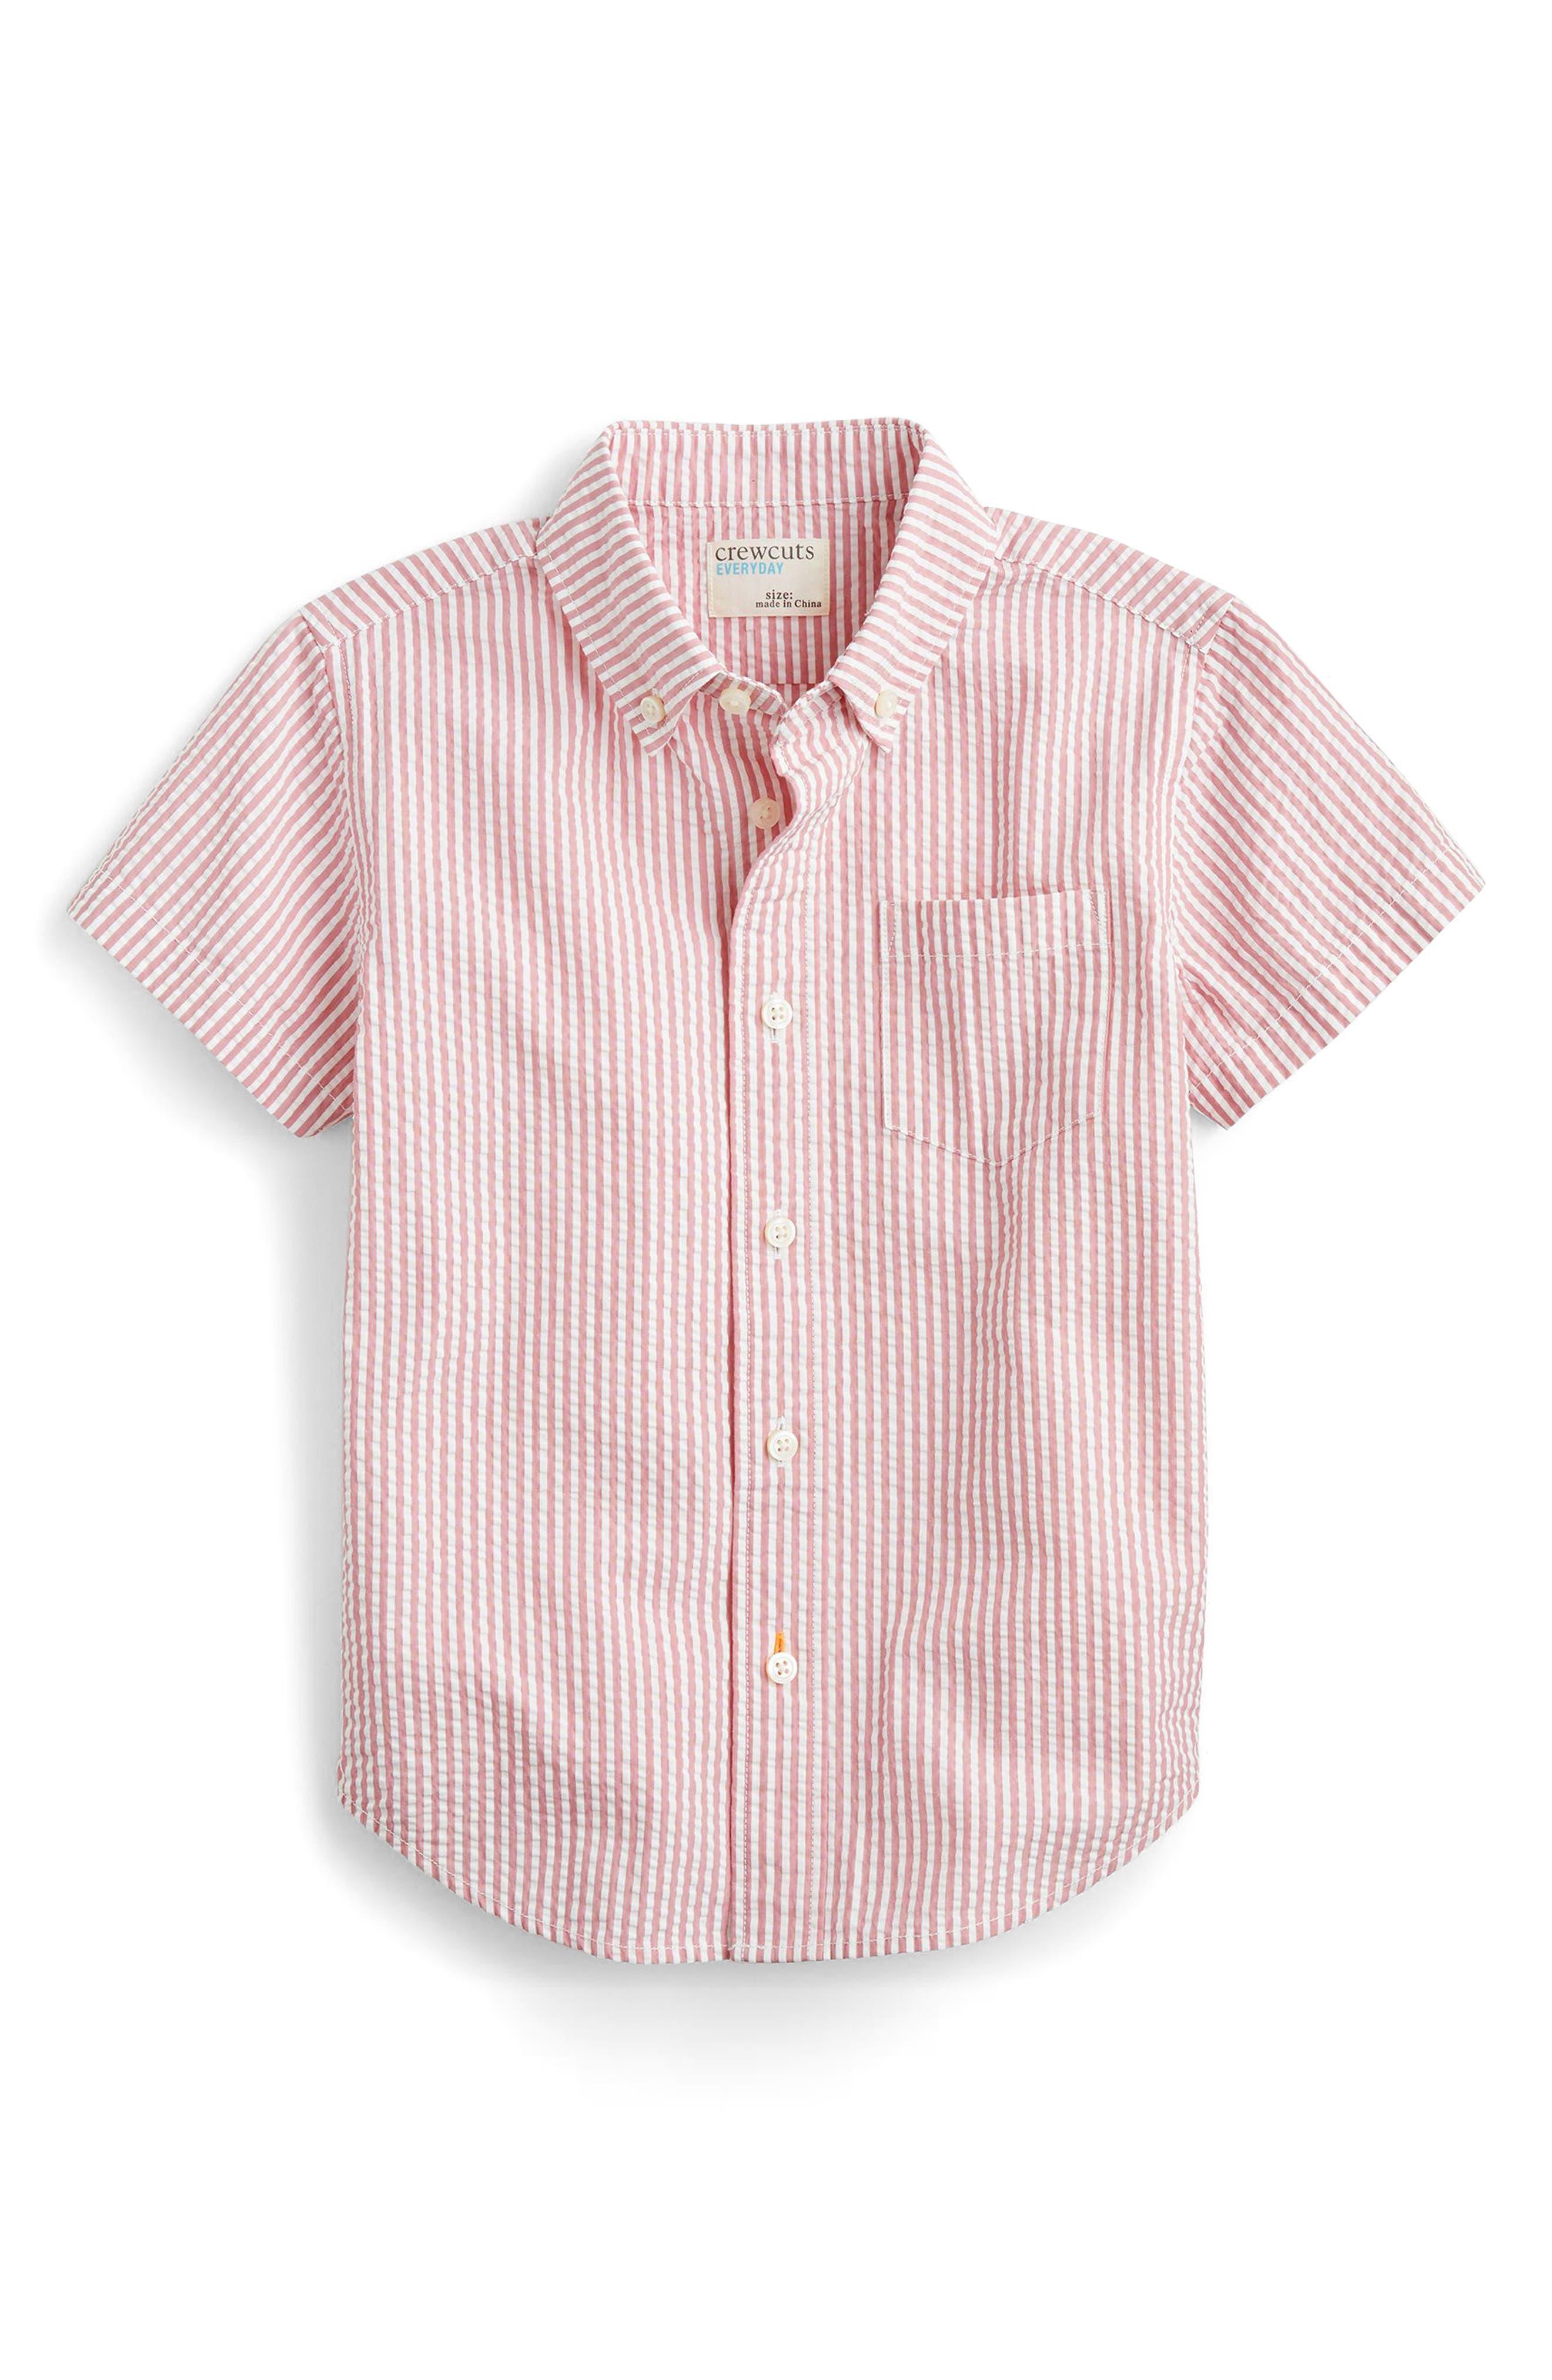 Seersucker Shirt,                             Main thumbnail 1, color,                             Vintage Pink